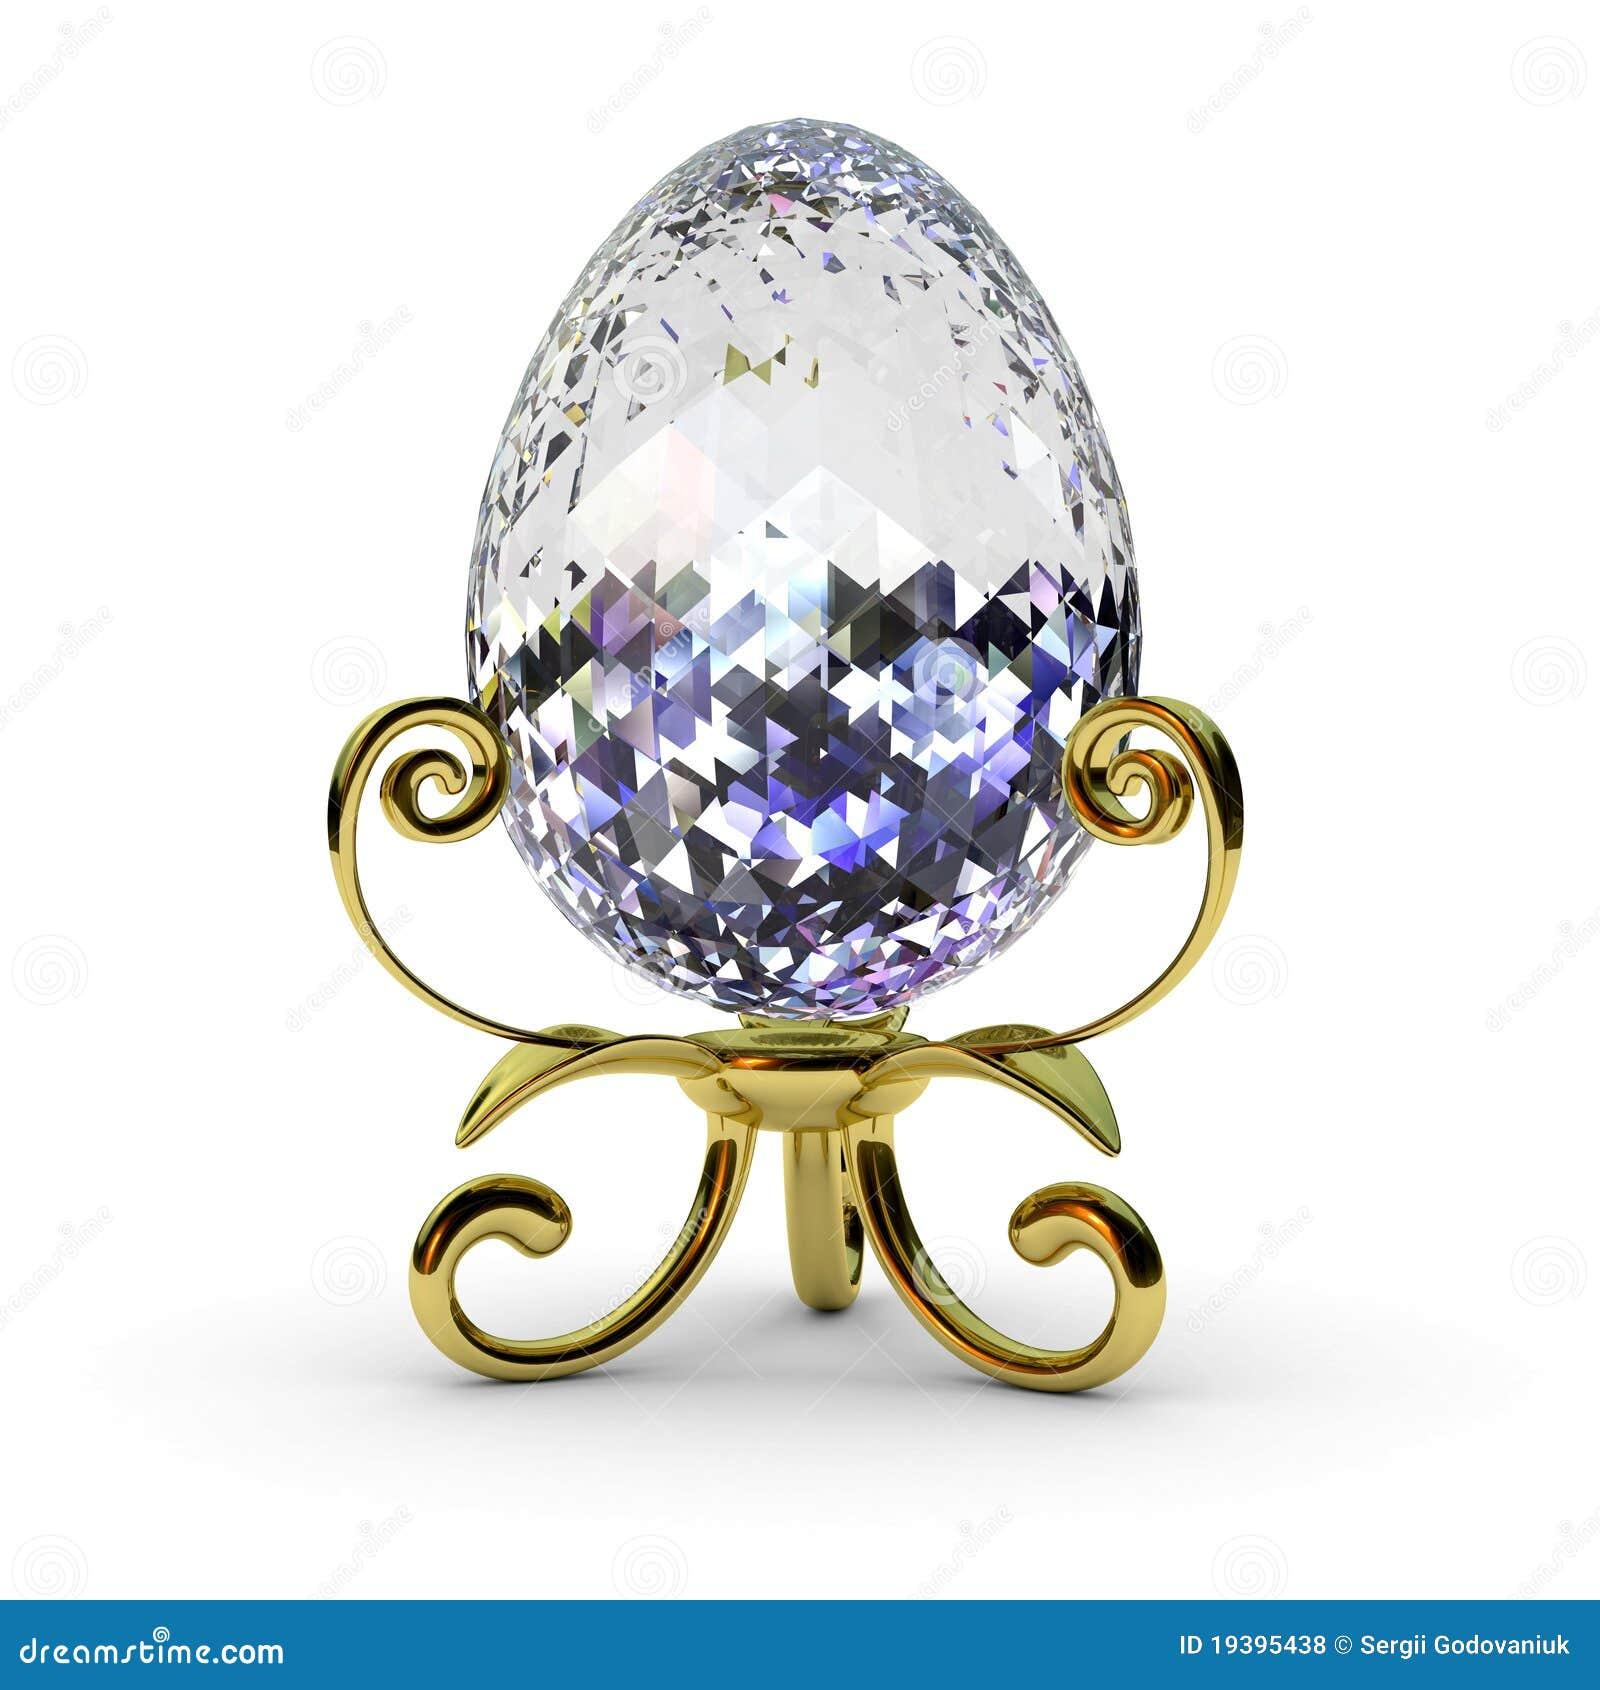 Where To Sell Diamond Jewelry